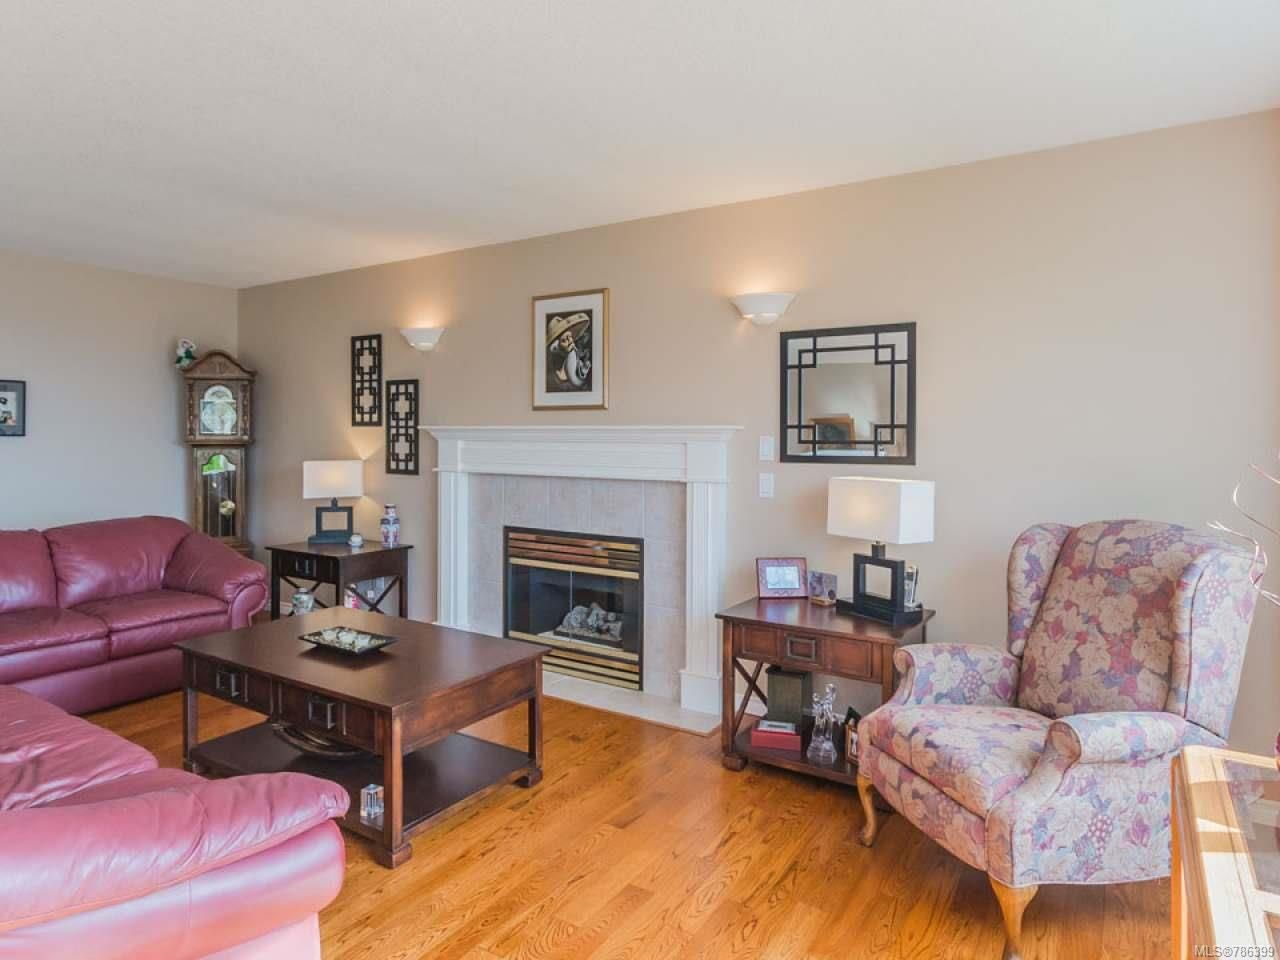 Photo 17: Photos: 5371 HIGHRIDGE PLACE in NANAIMO: Na North Nanaimo House for sale (Nanaimo)  : MLS®# 786399